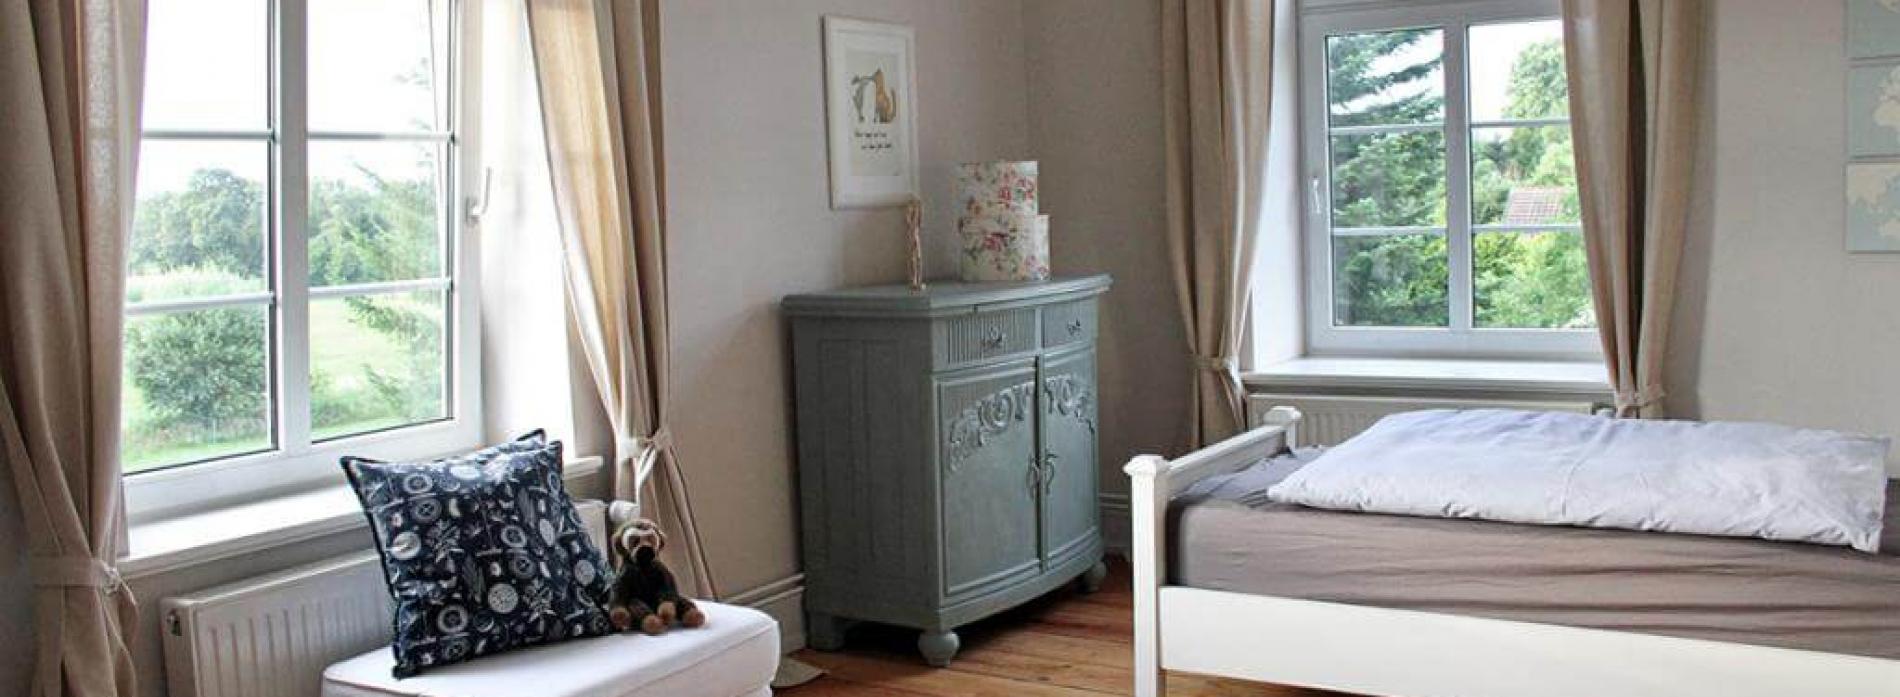 Gutshaus Volzrade Riviera Maison Betten duck egg green